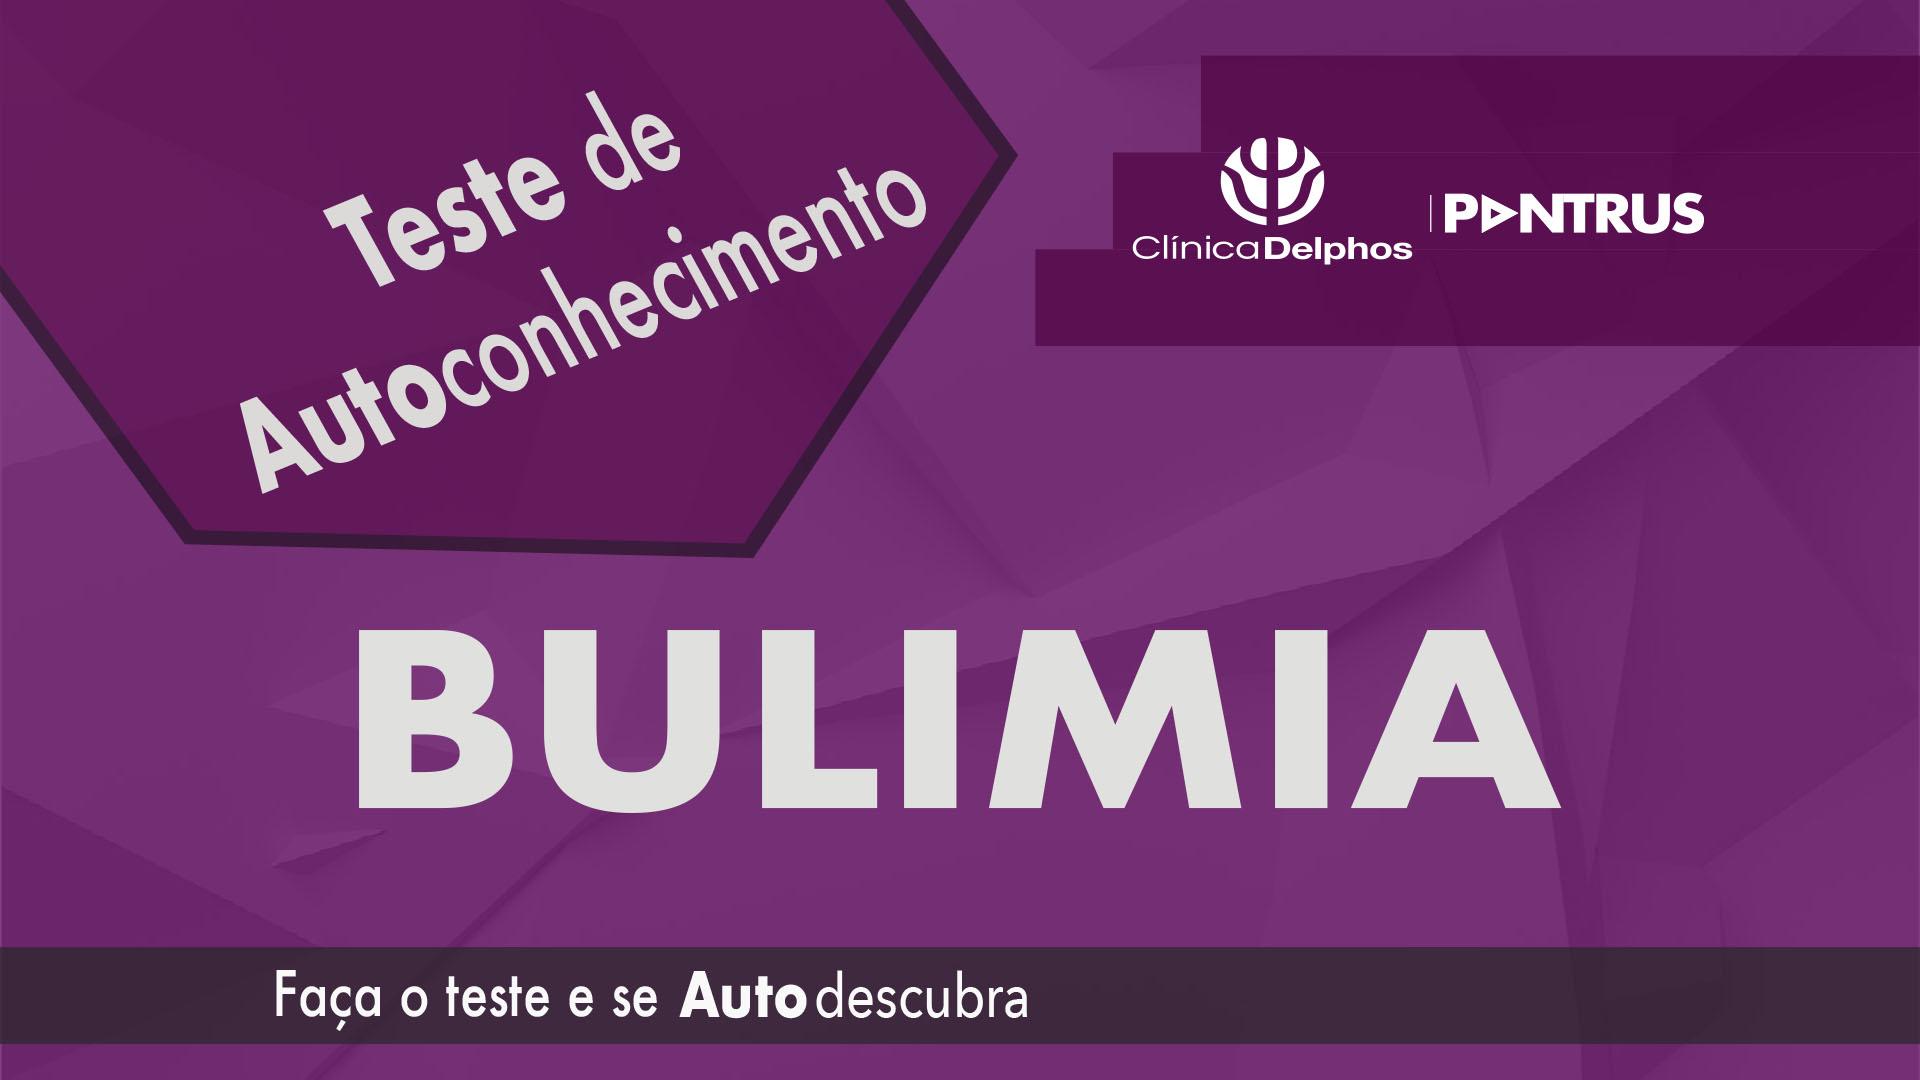 Teste Bulimia Nervosa